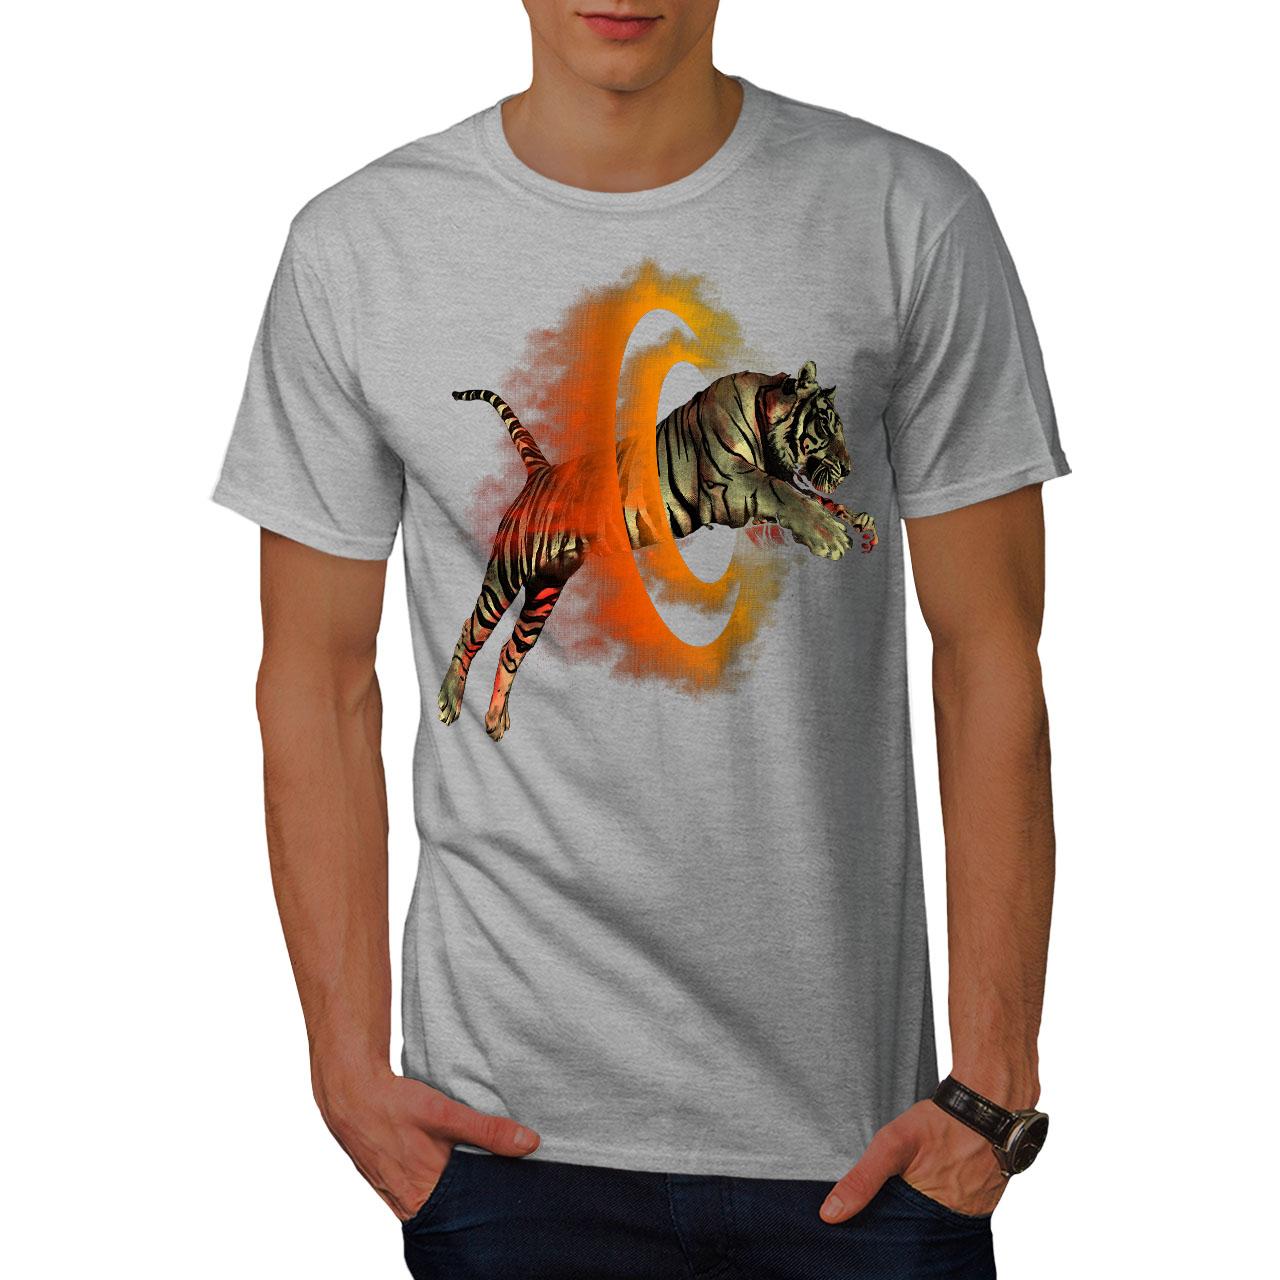 Wellcoda-Tiger-Portal-Cool-Mens-T-shirt-Flame-Graphic-Design-Printed-Tee thumbnail 15